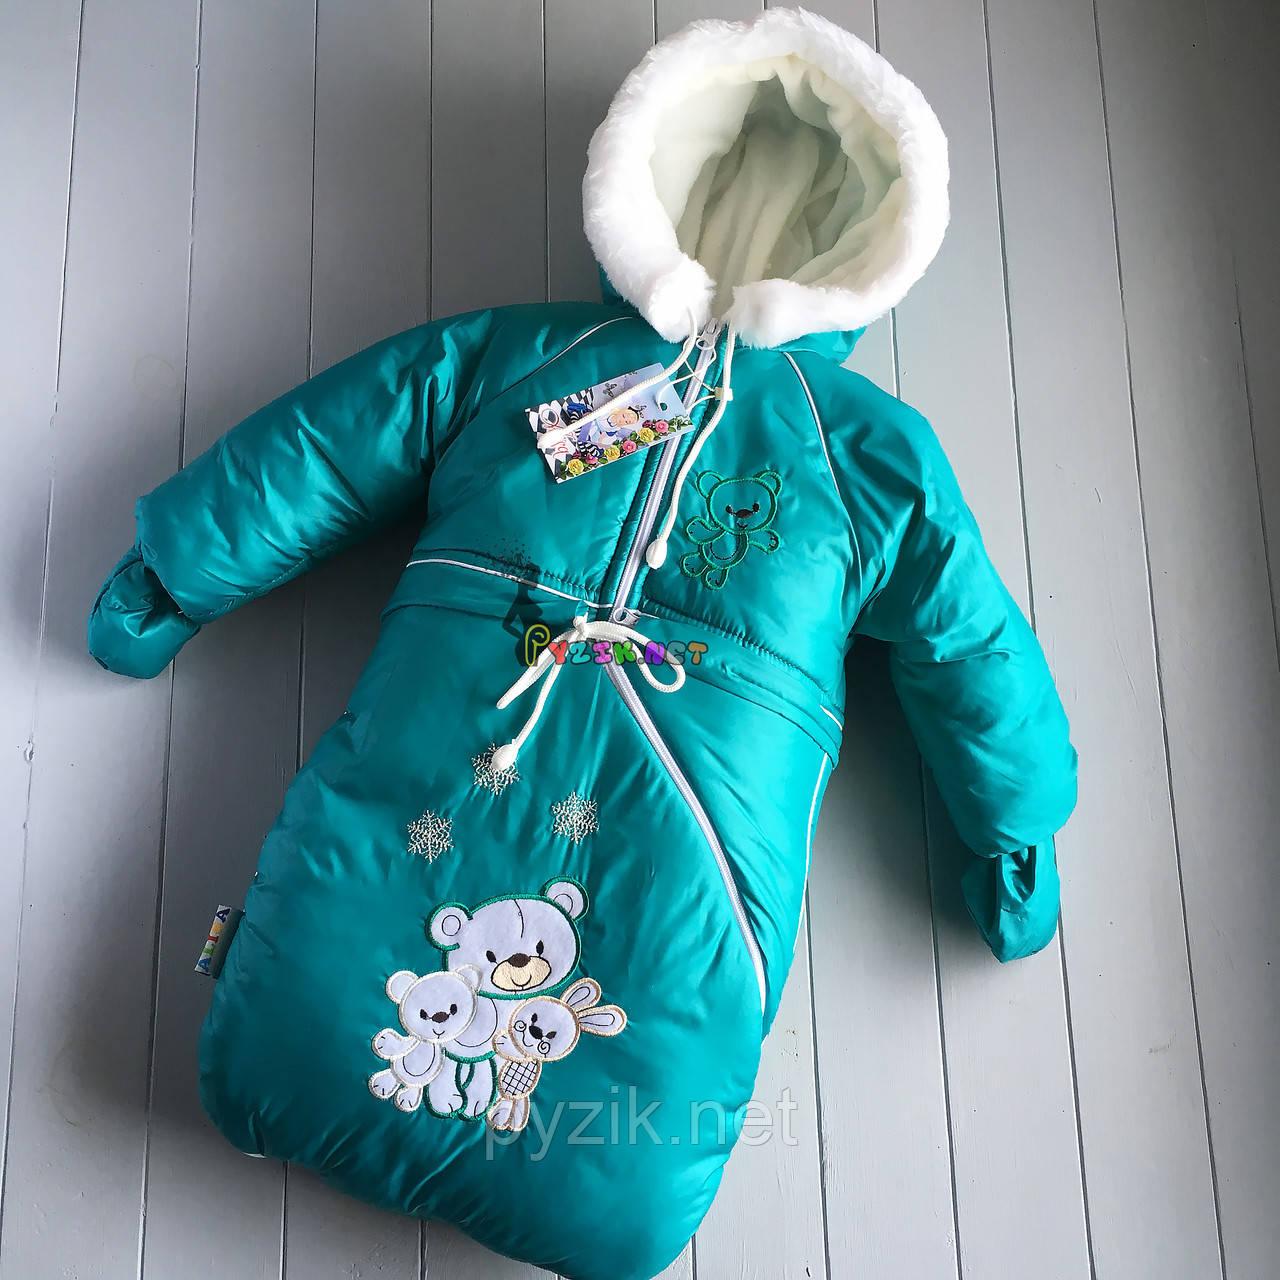 Детский зимний комбинезон-трансформер (куртка+штаны комбинезон+мешочек), бирюзовый